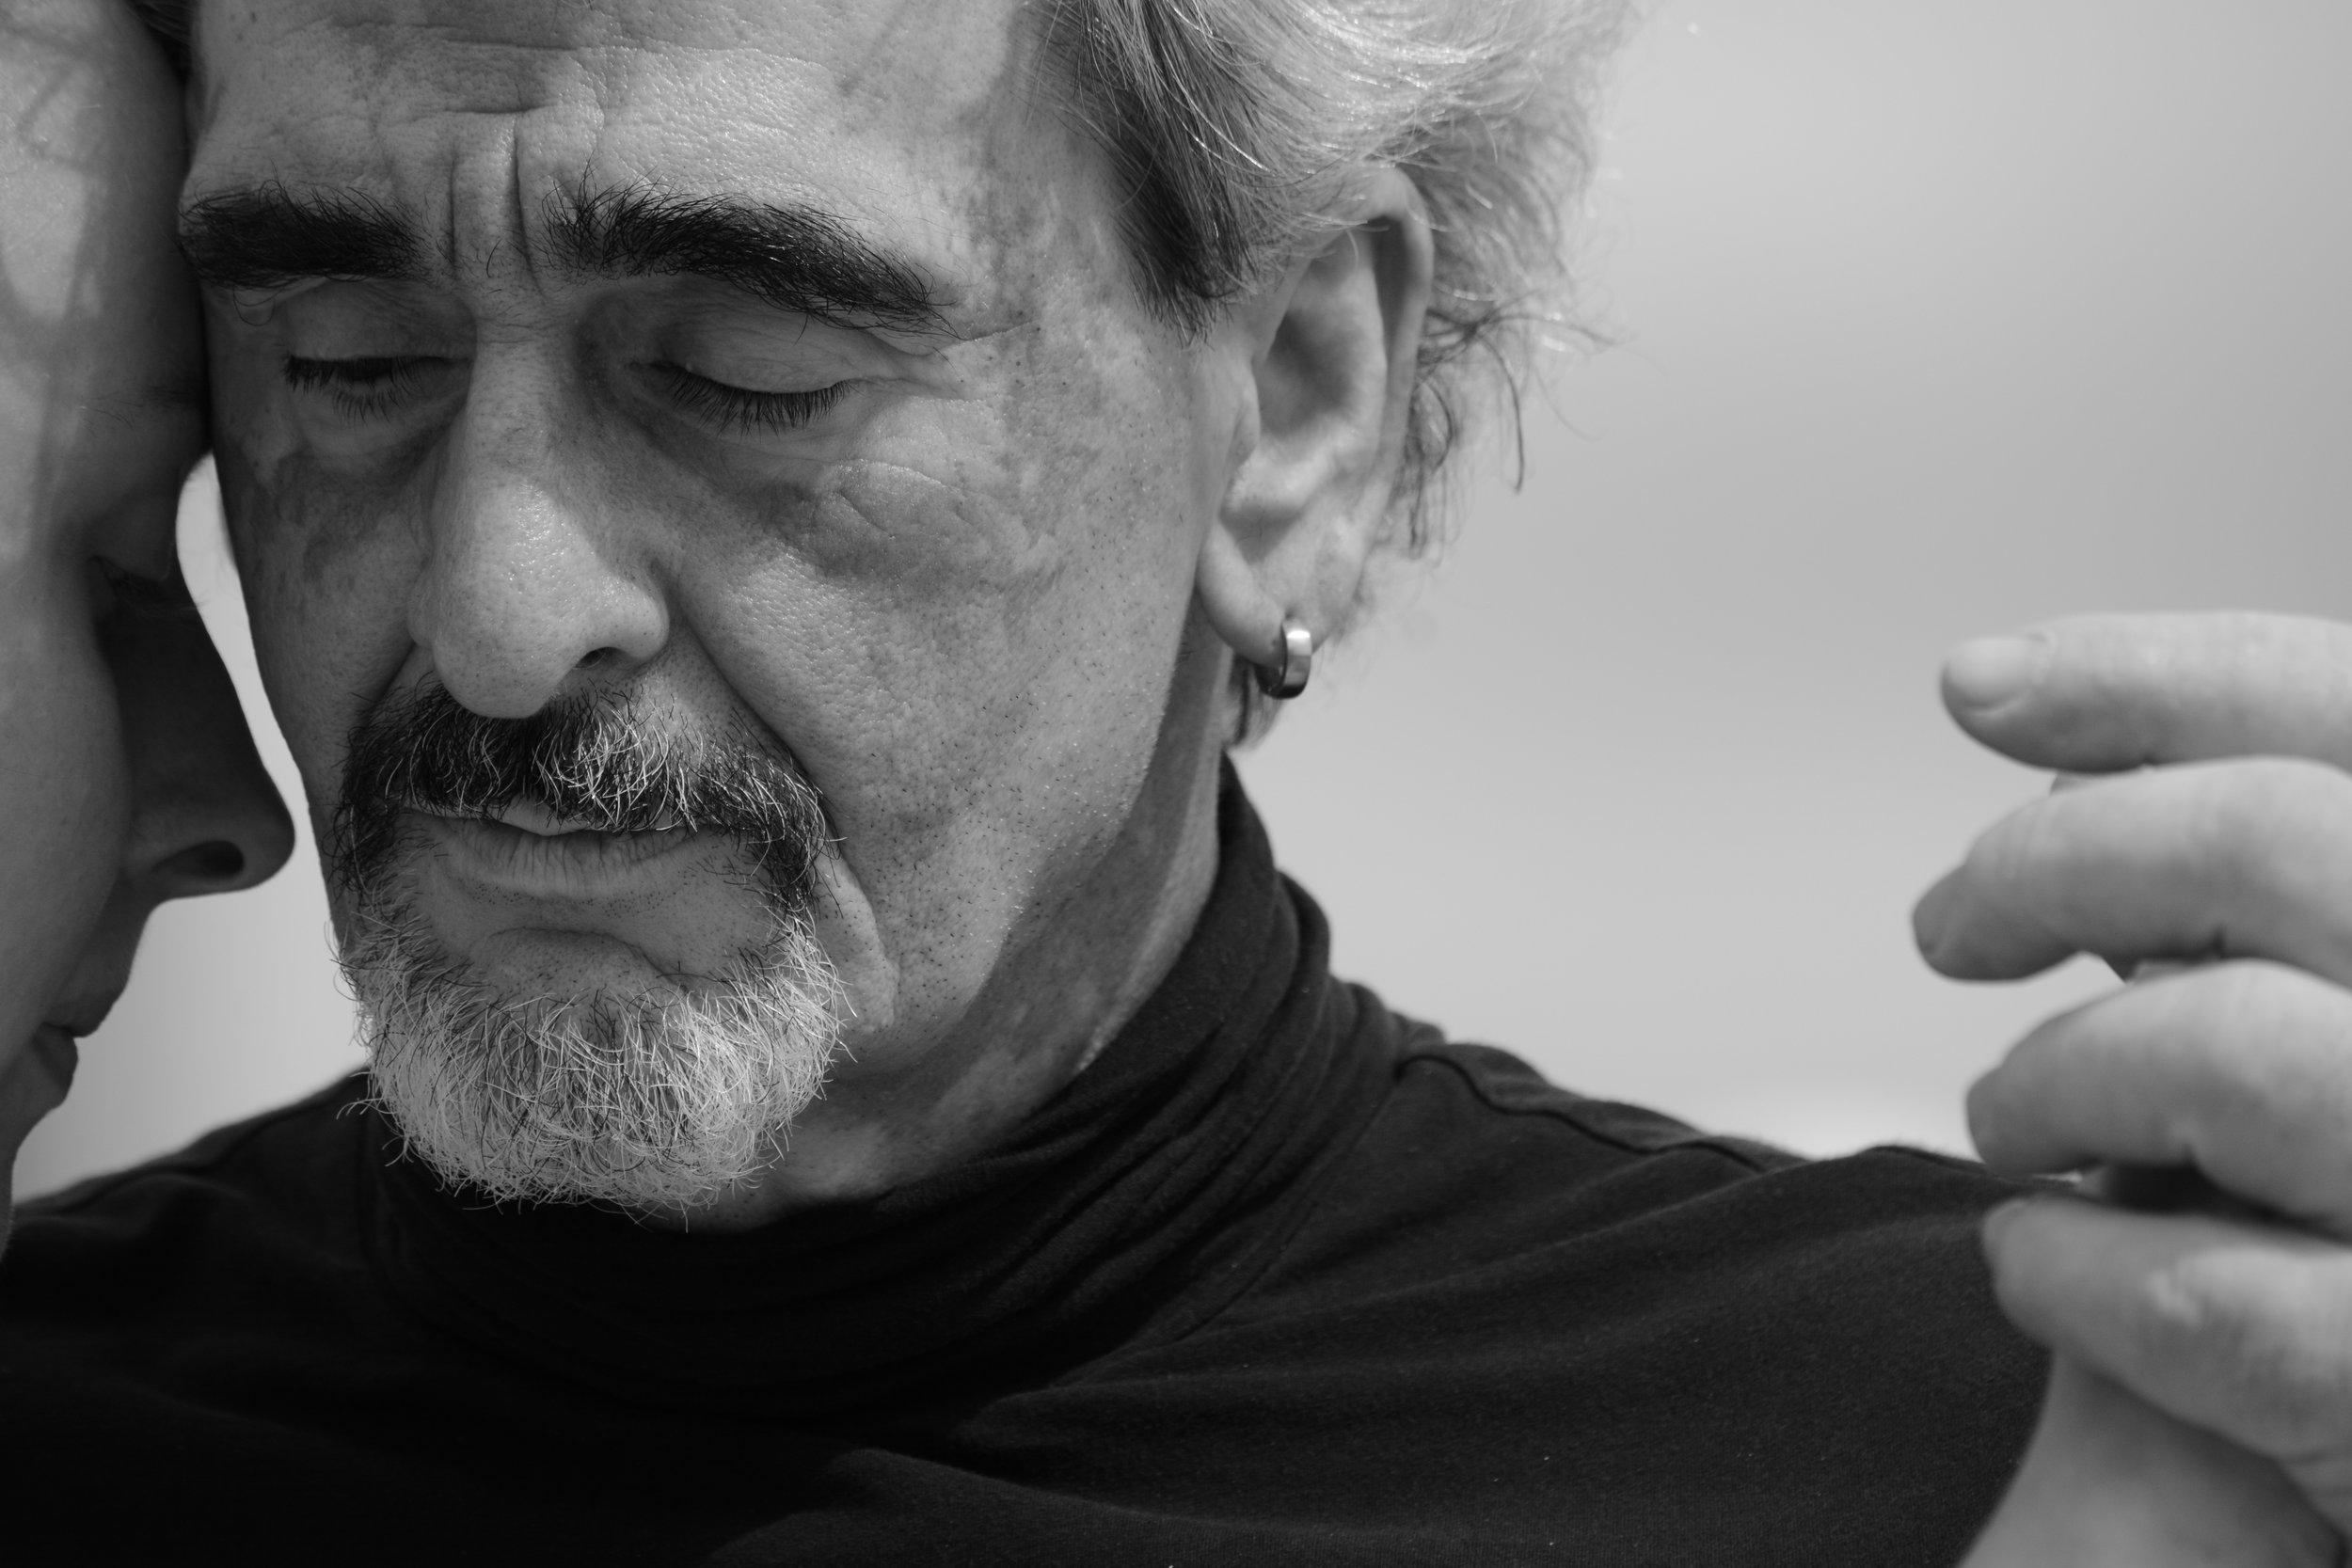 hamburg-tango-argentino-festival-dance-163249.jpeg